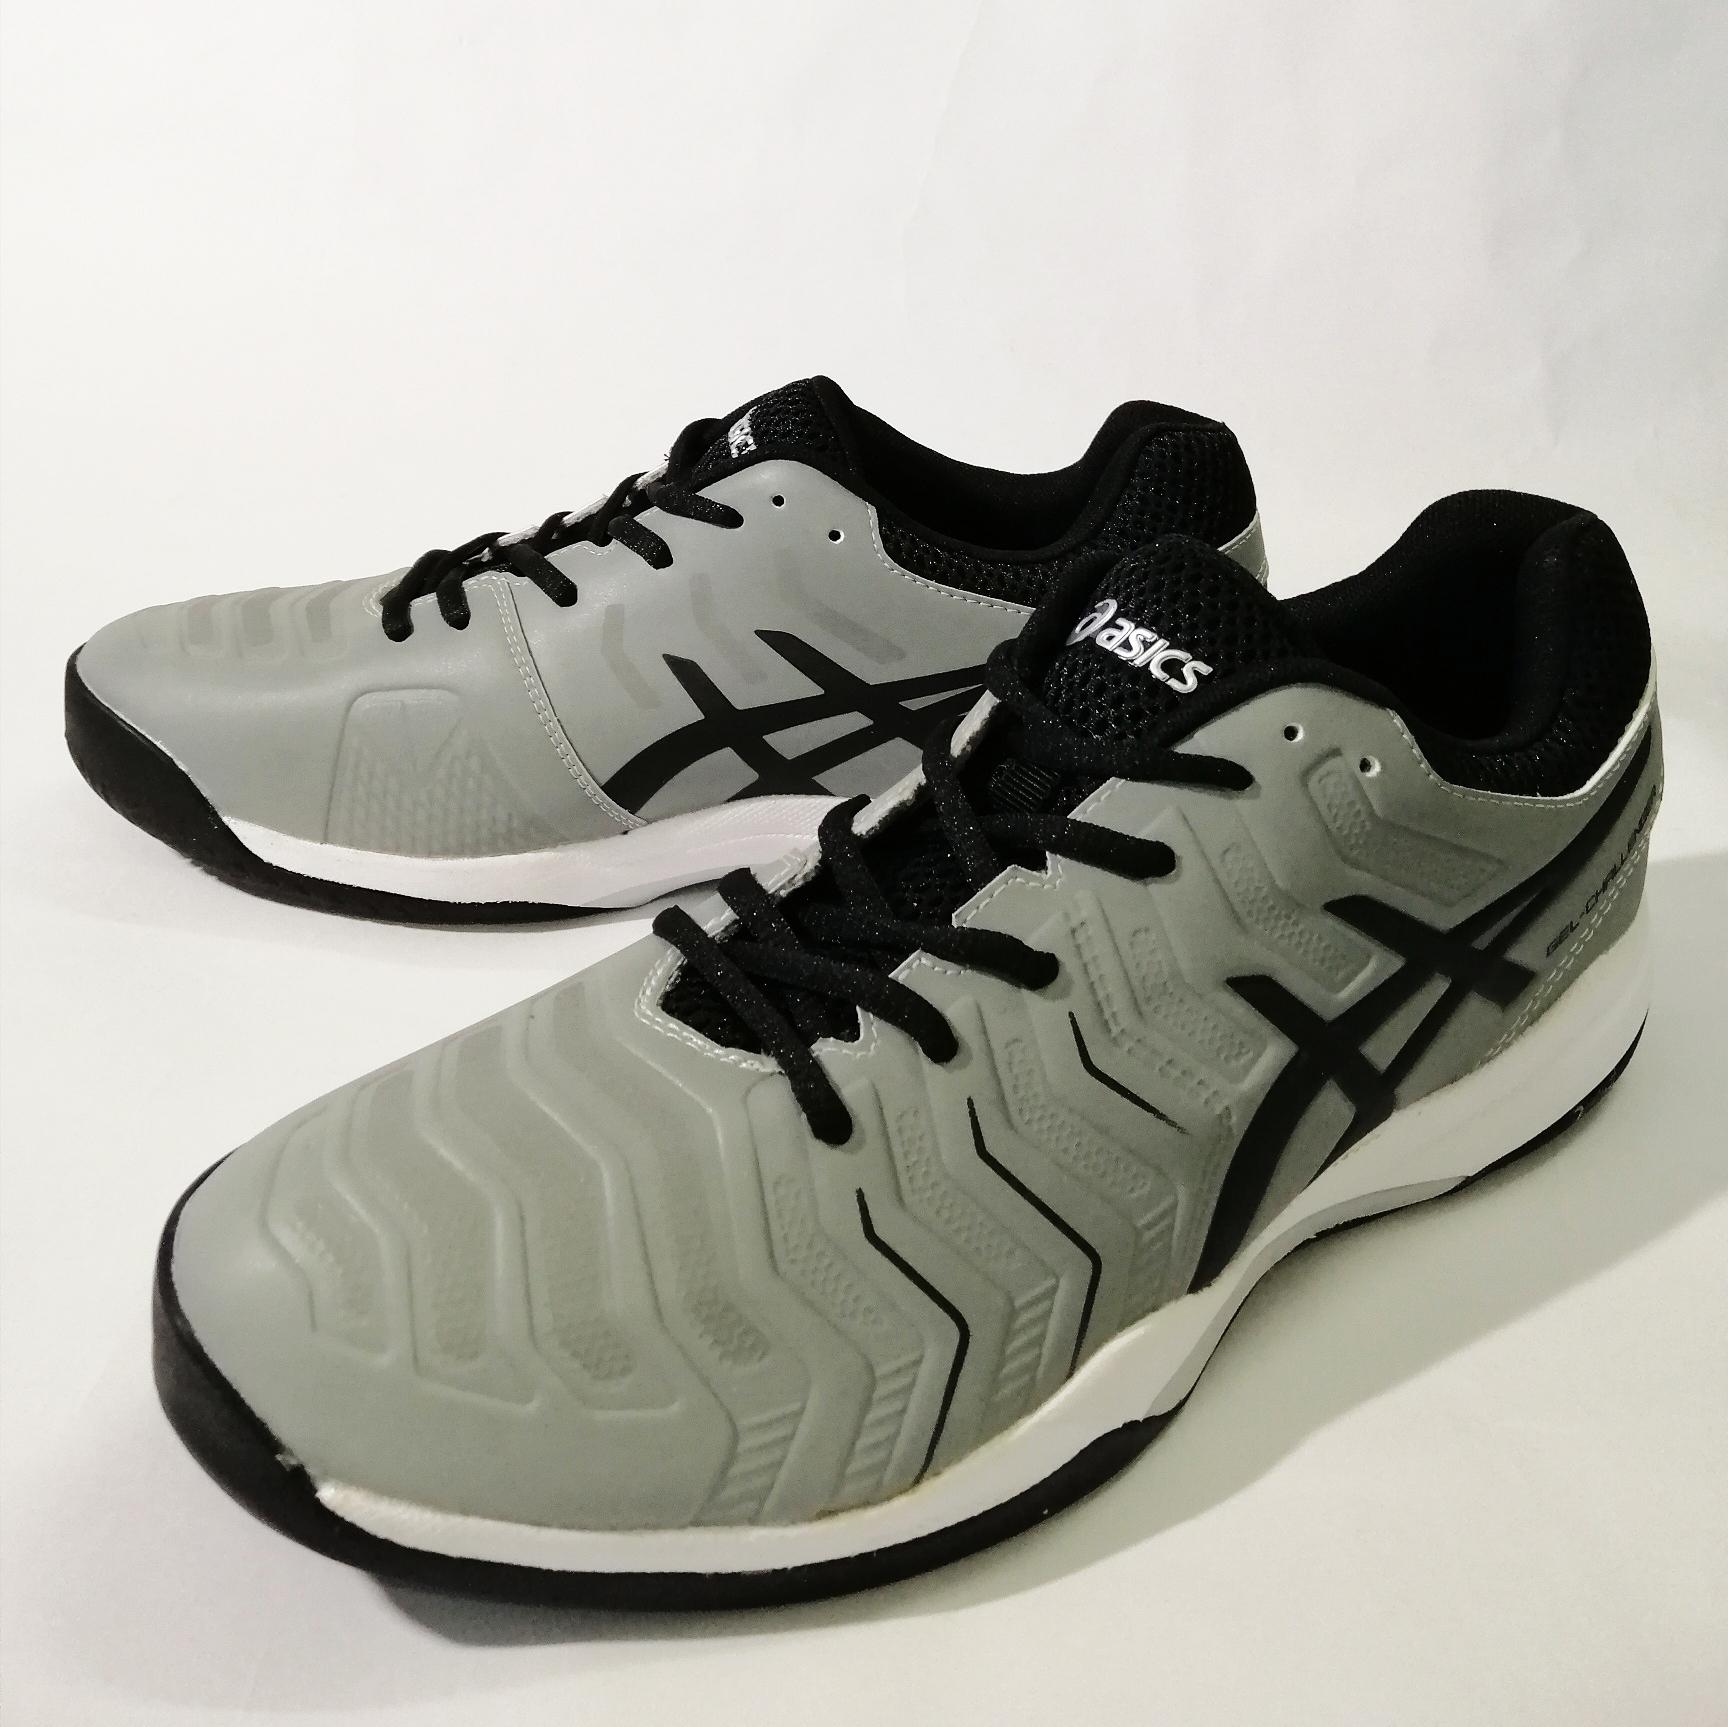 giày tennis asics 2020